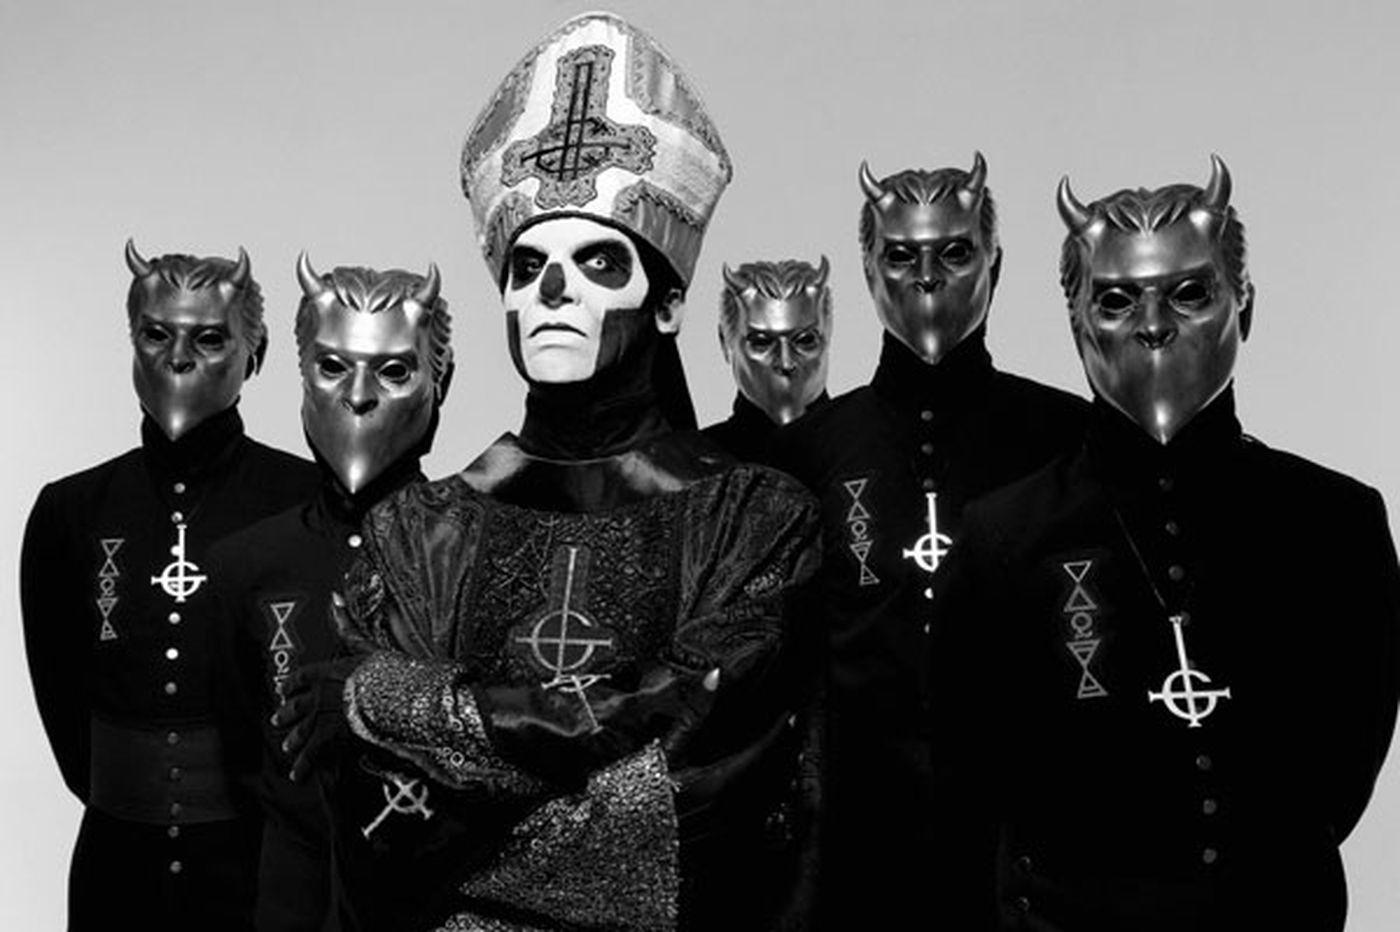 Anti-pope band reschedules black mass